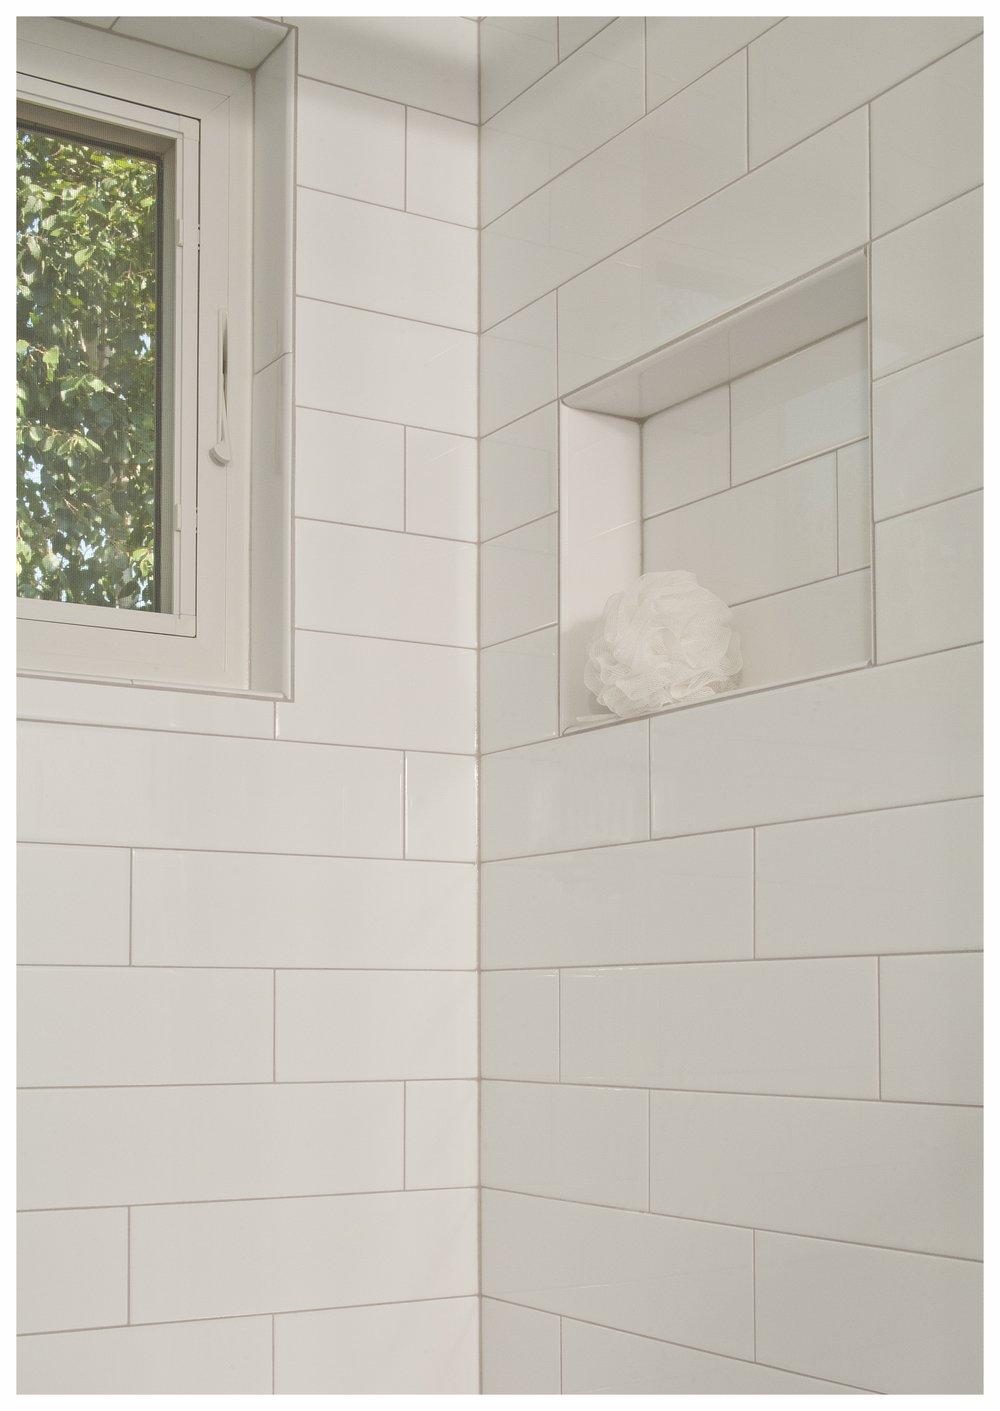 Bellevue Lakemont Tradational Small Bath 3.jpg